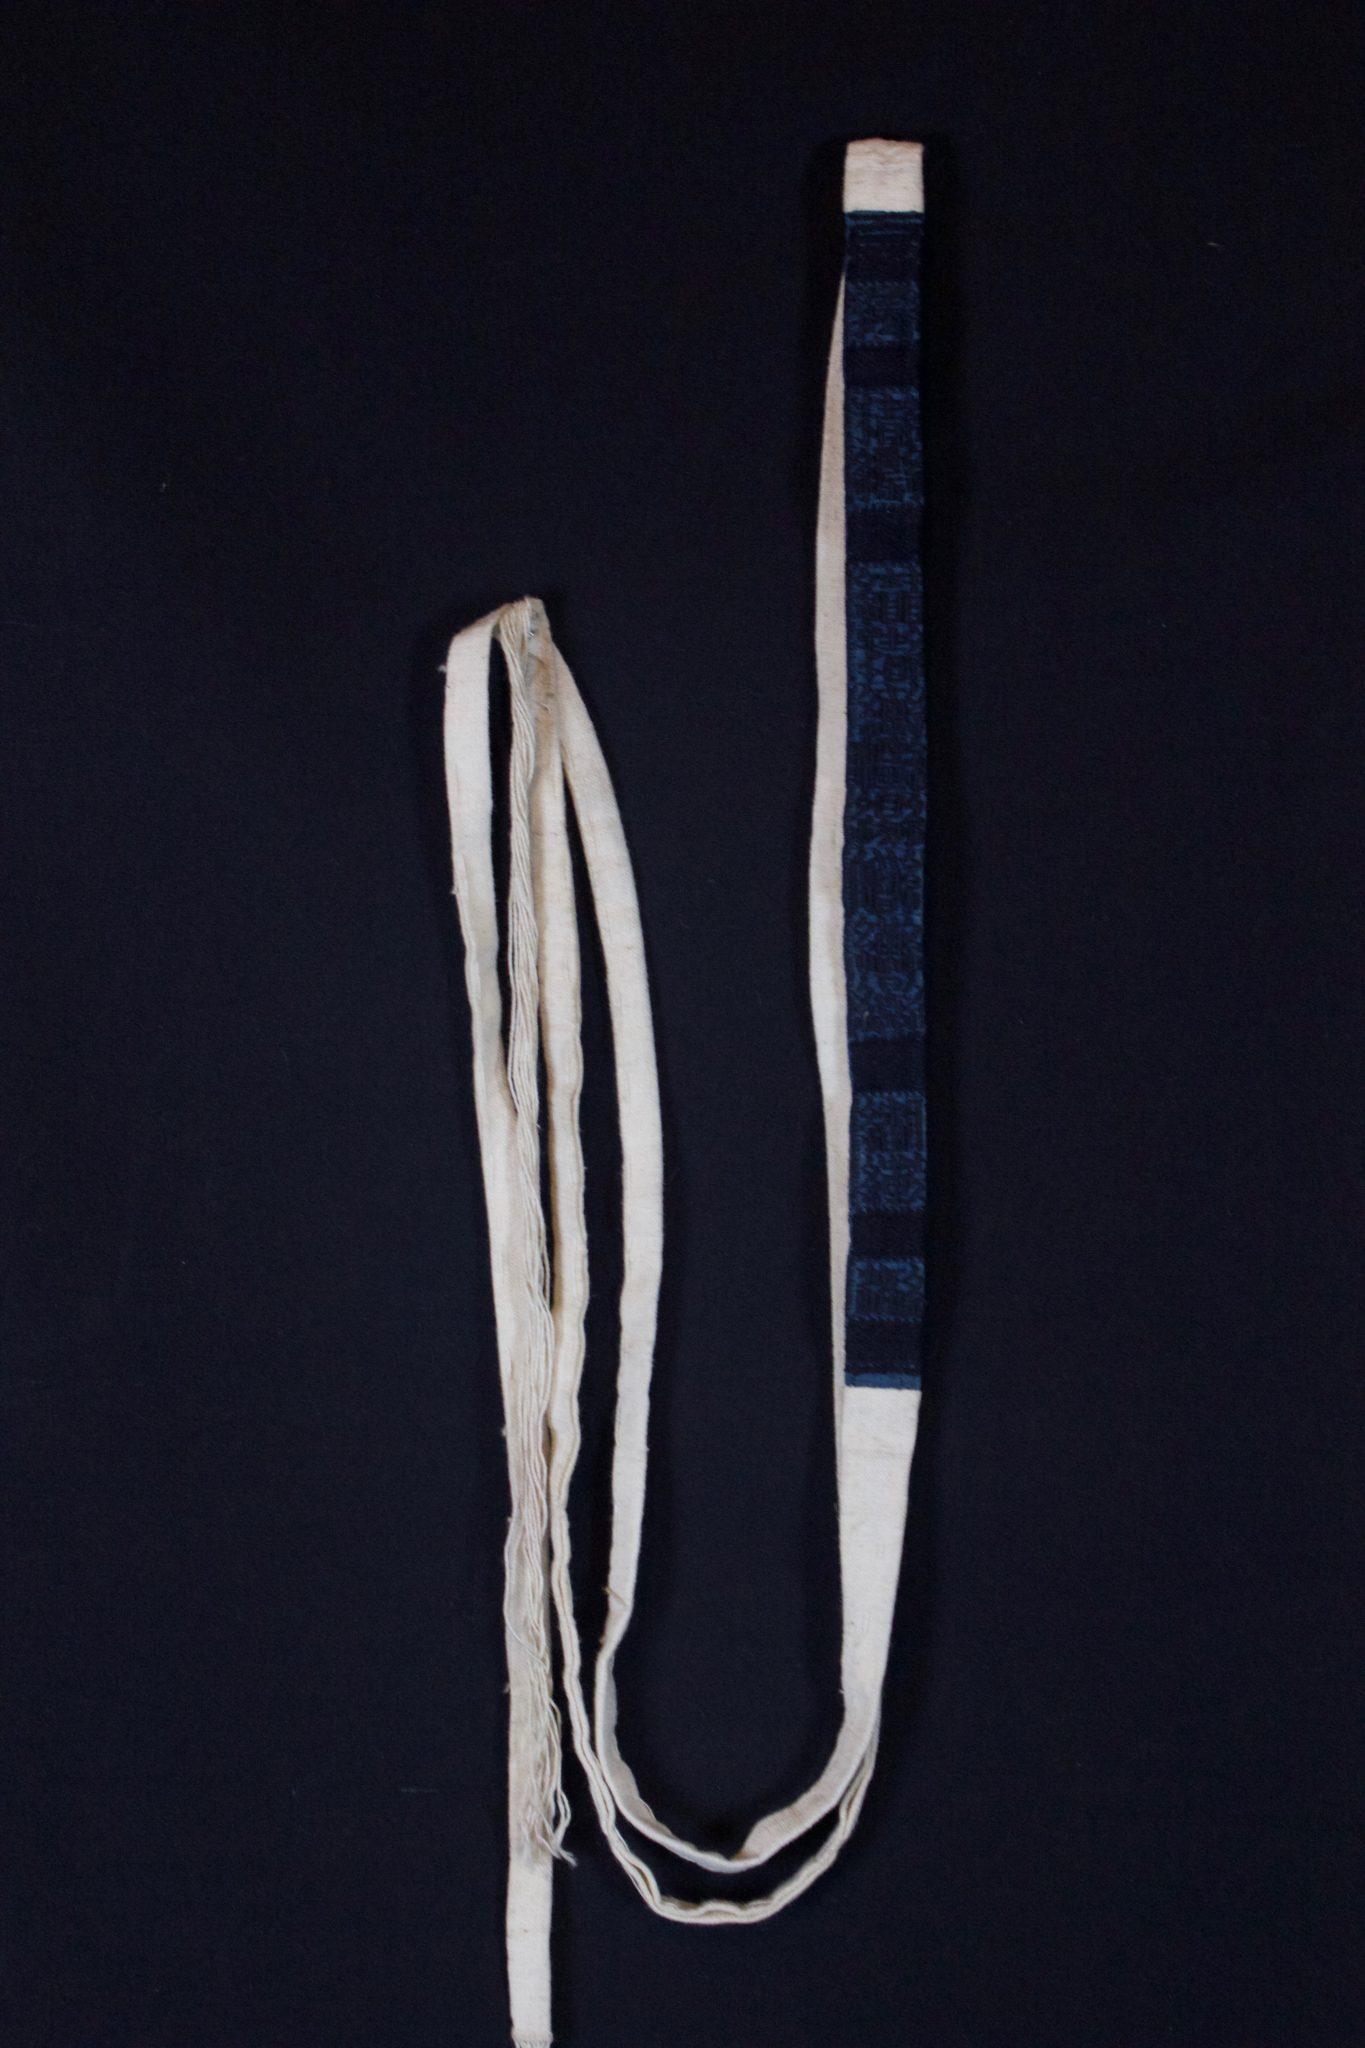 "Shaman Belt, Vietnam, Yao people, Mid 20th c, Cotton cloth, indigo dye, Part of shaman's costume. 110"" x ¾"""" x ⅛"", $30"